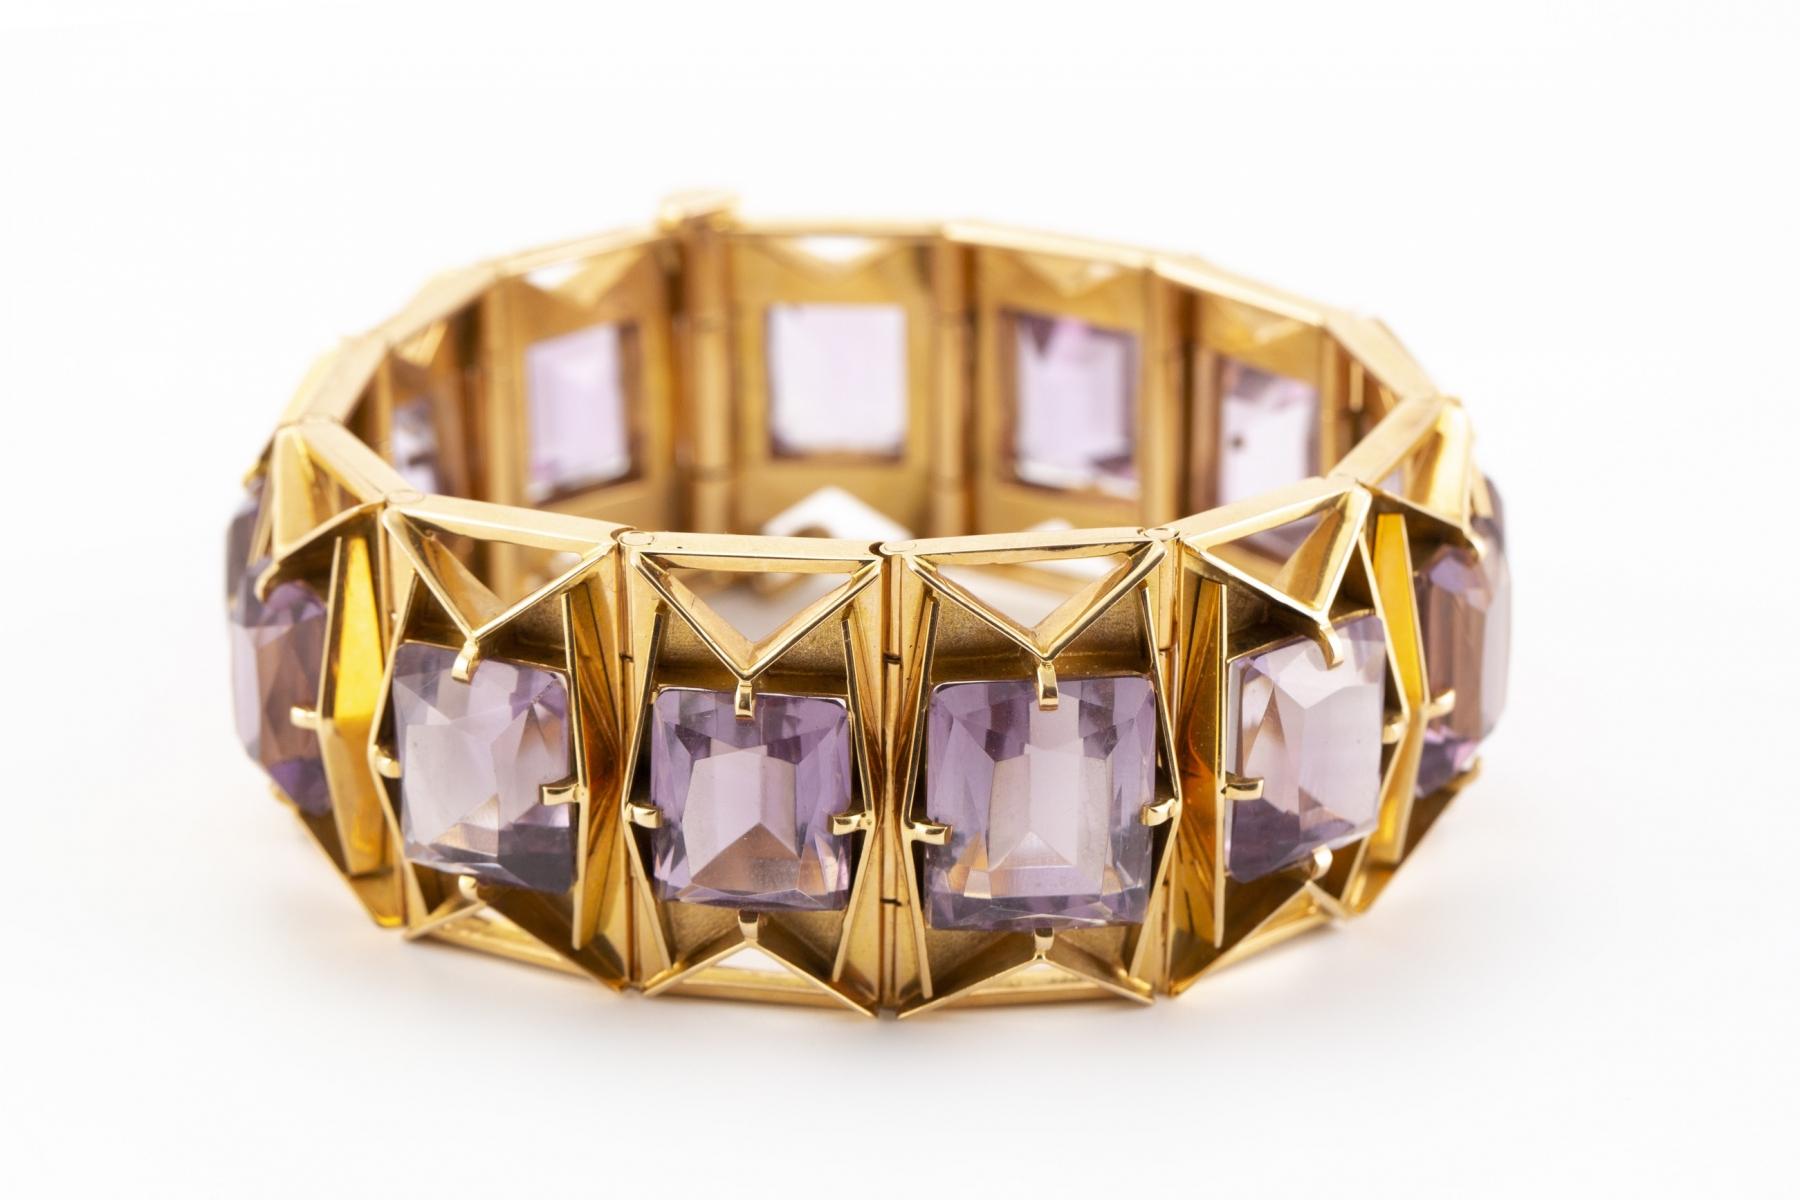 30 - Boissonet Paris. Bracelet semi rigide en or jaune serti d'amethystes. Adjugé 3360€